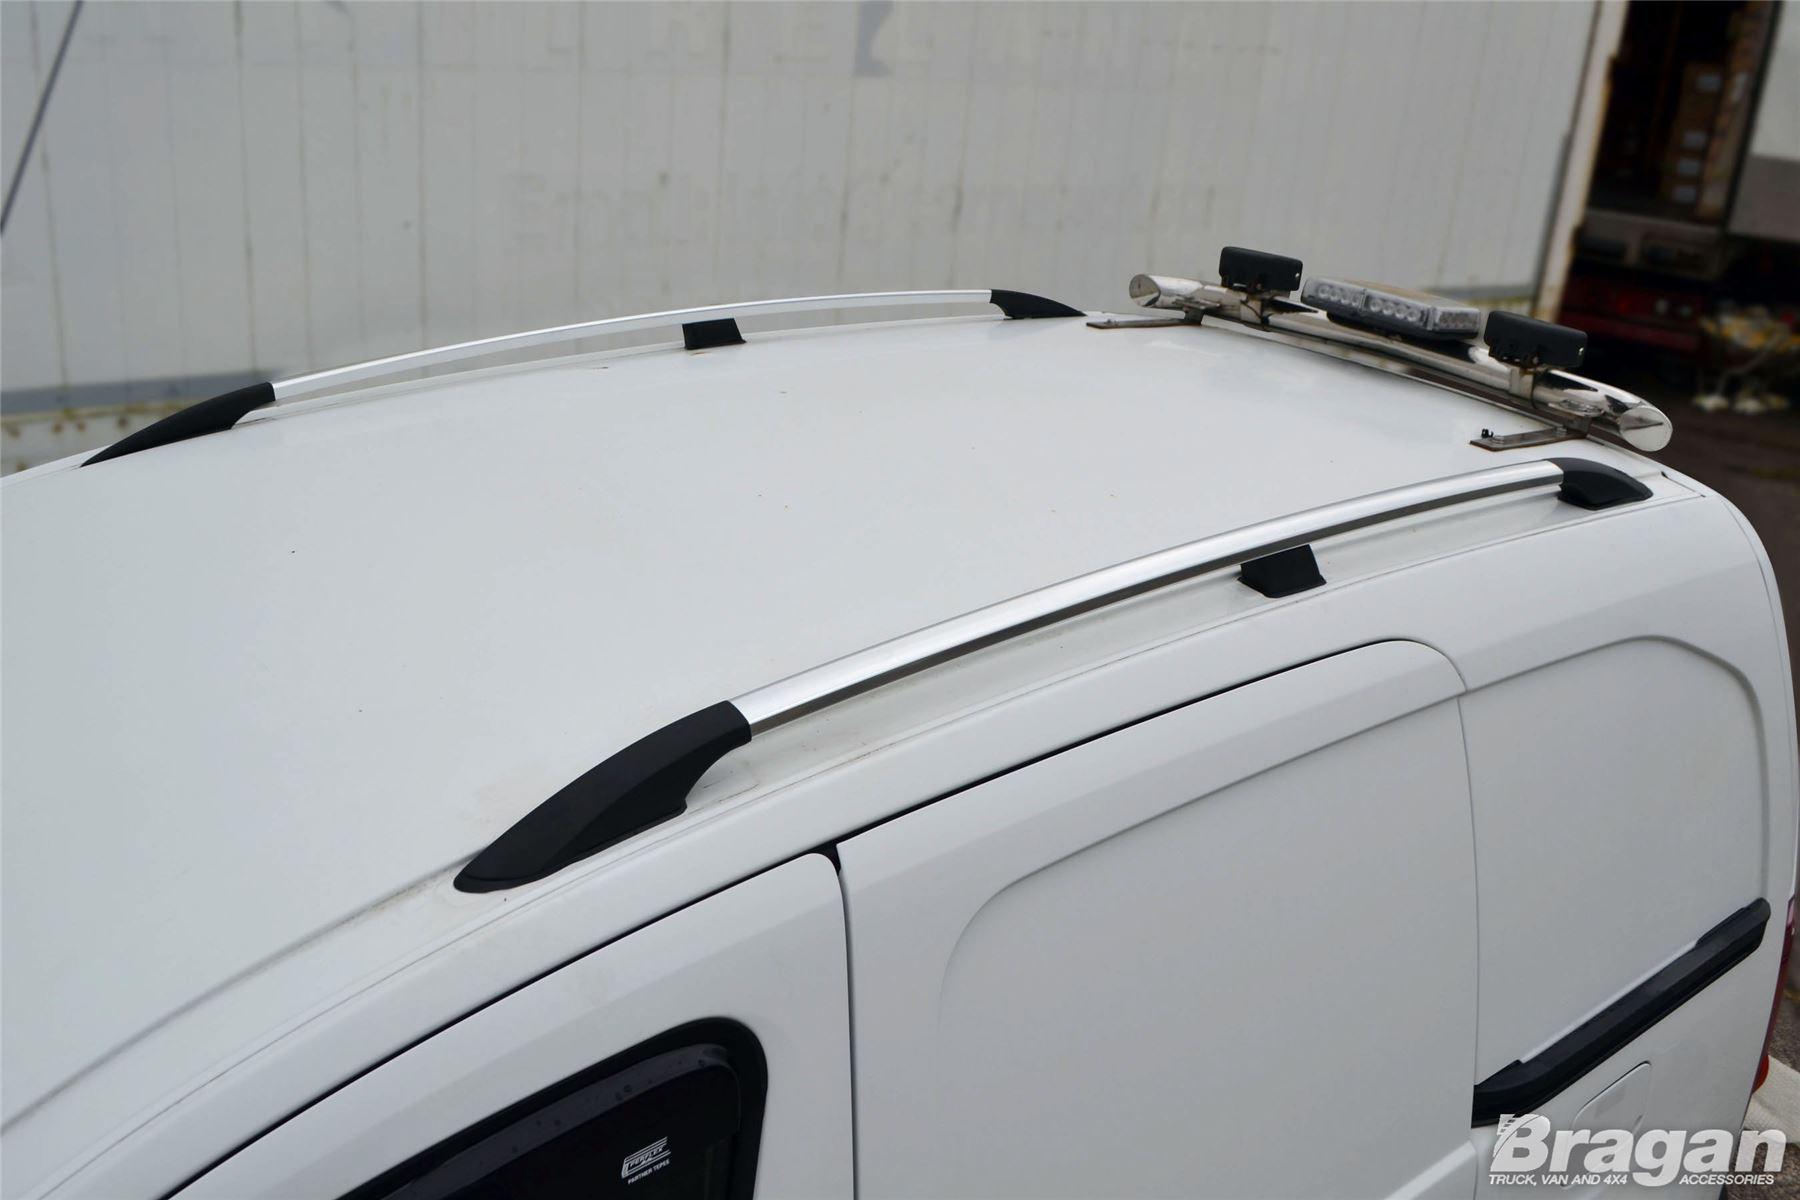 To Fit 2012-2019 Opel Vauxhall Combo D LWB Black Aluminium Roof Rails Rack Bar